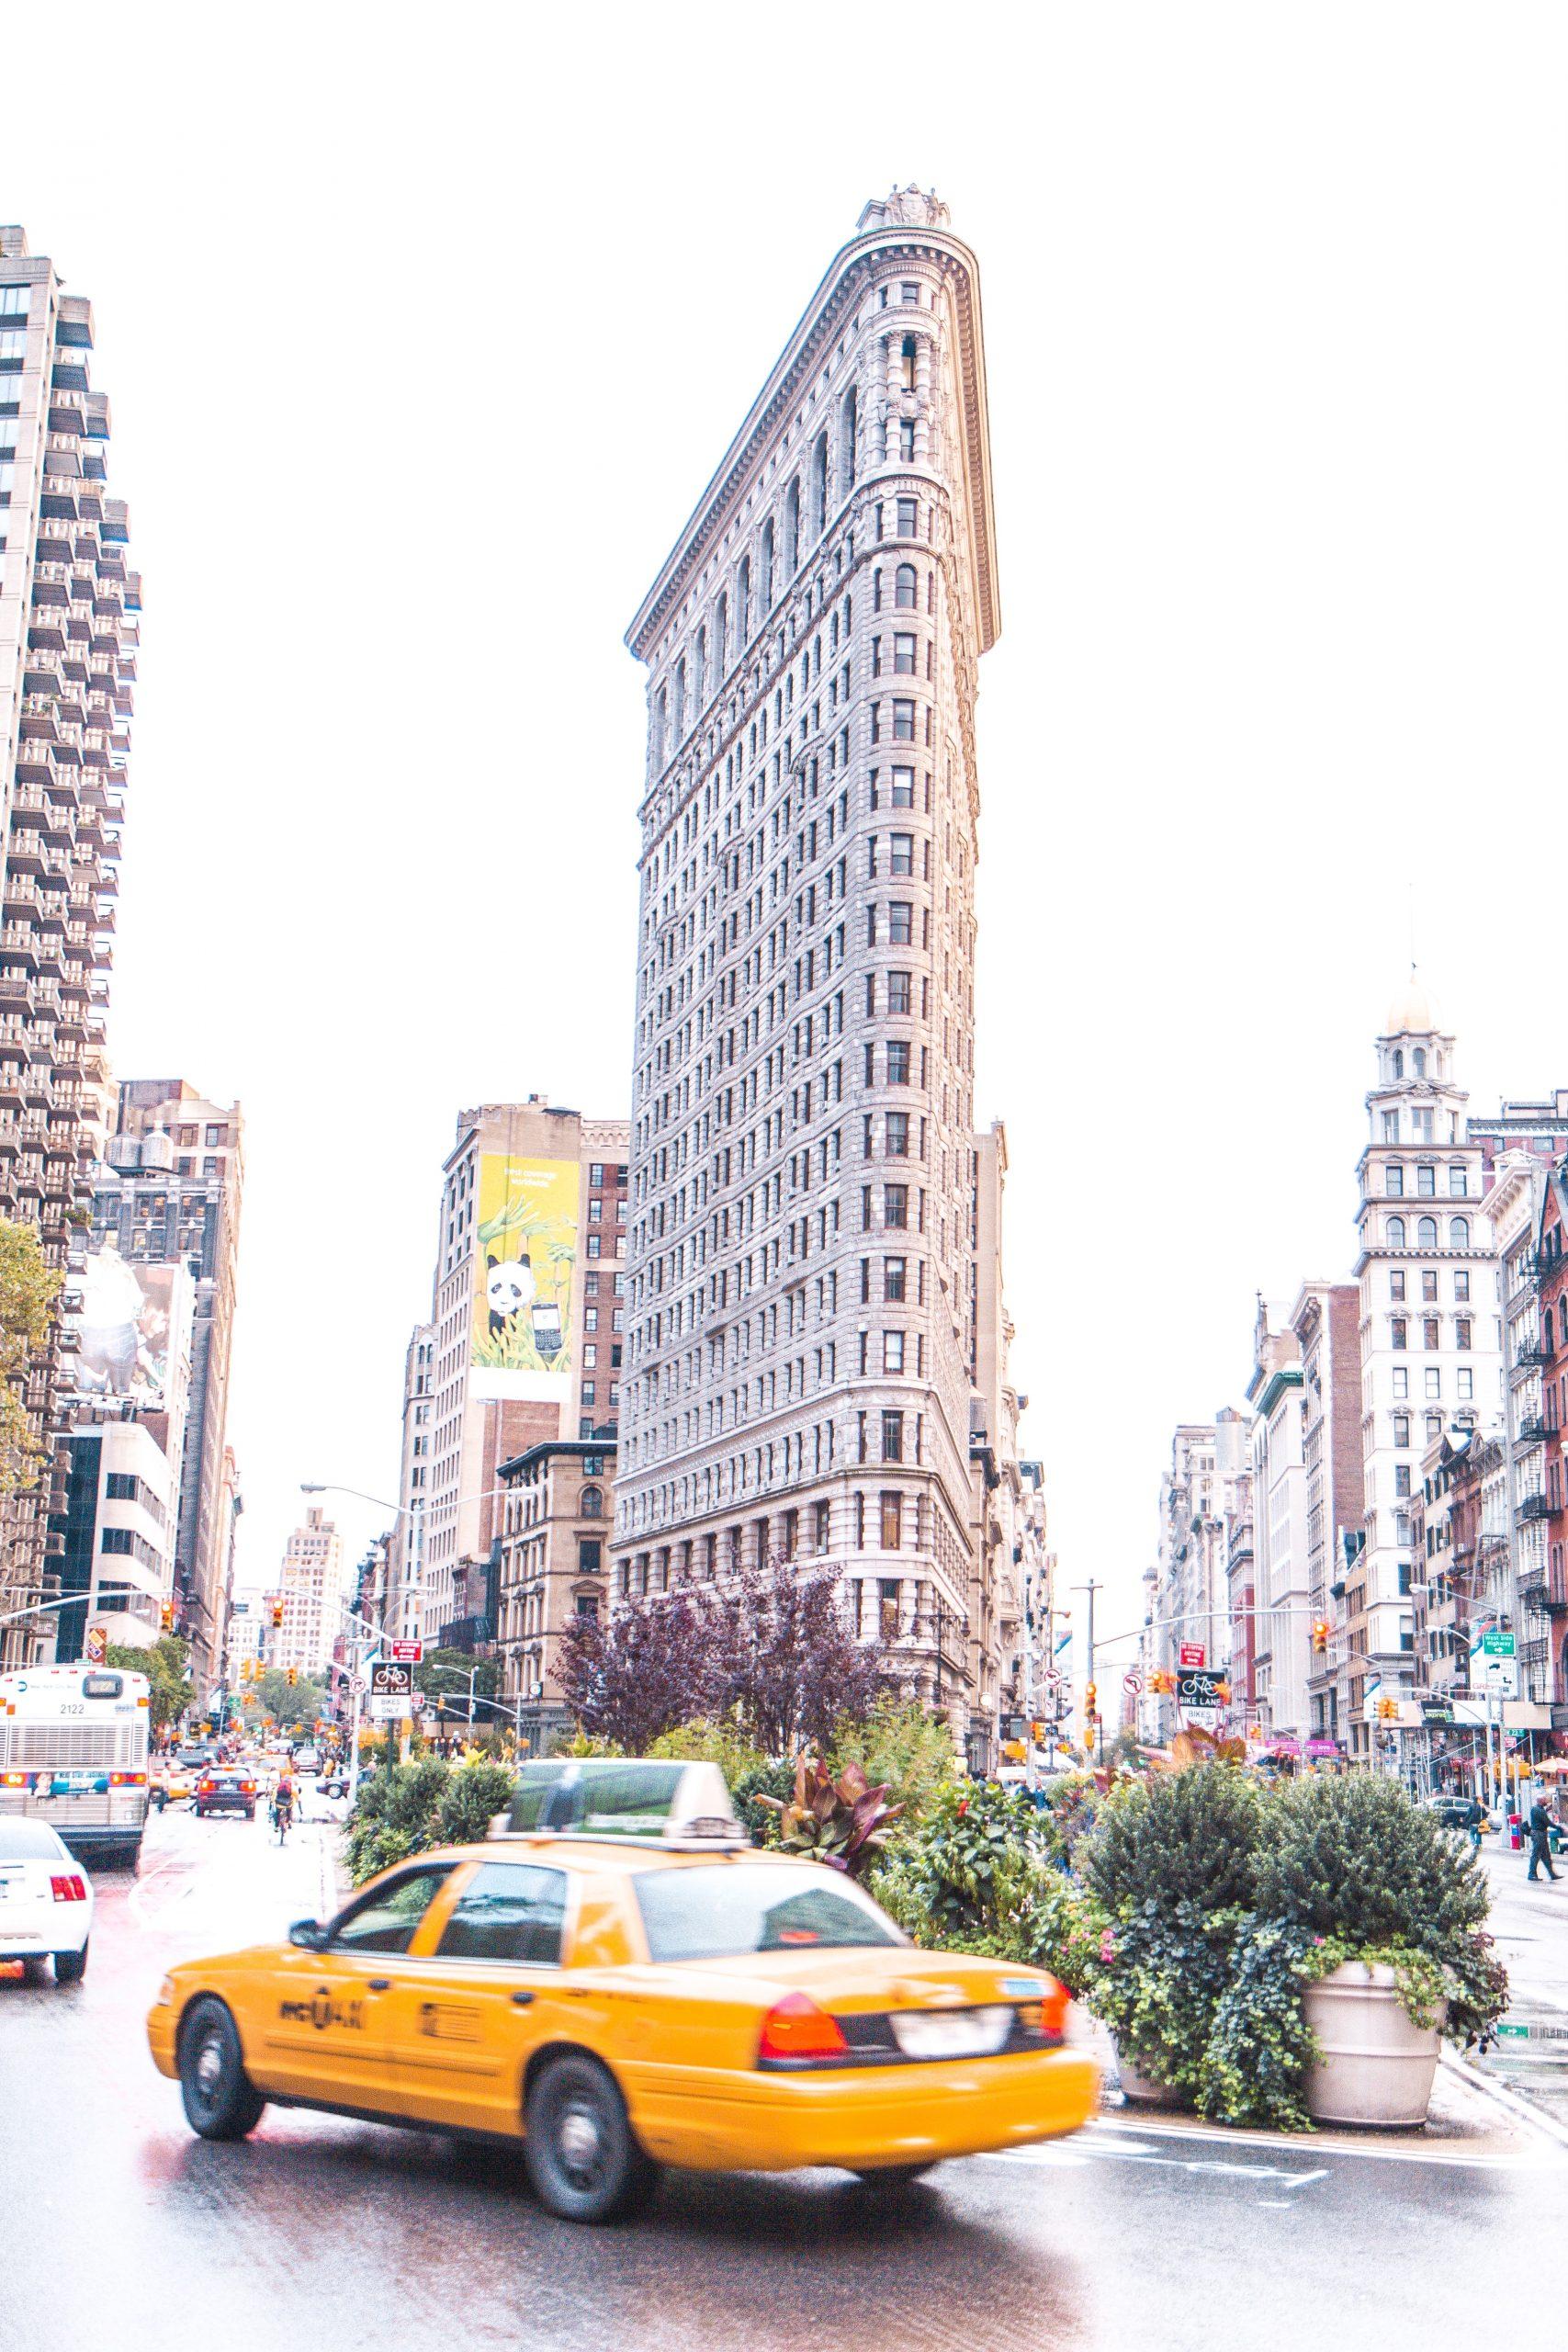 Flatiron Building, New York - Giddy Guest